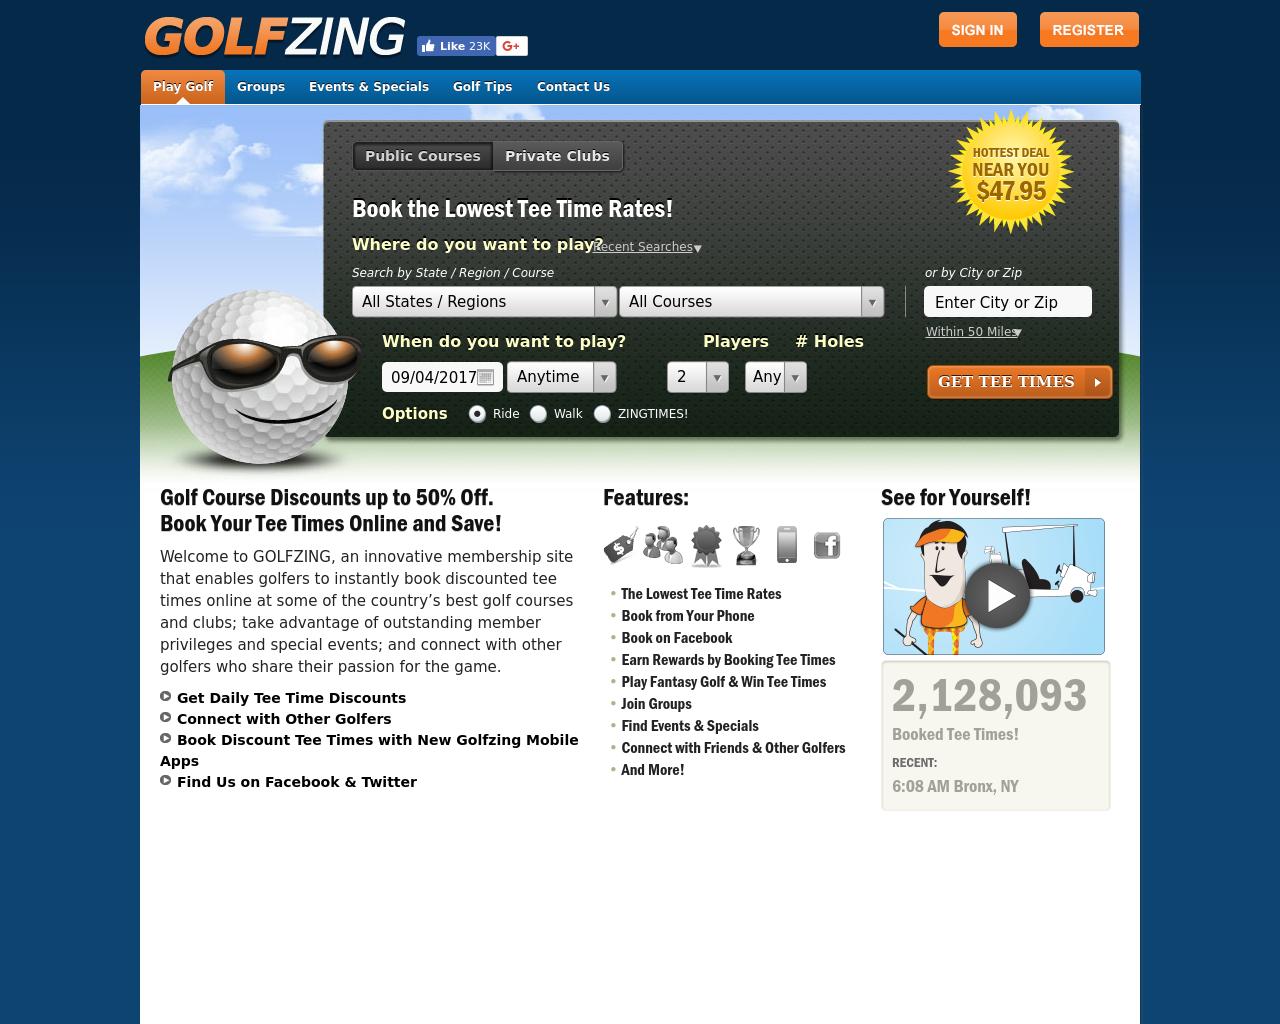 Golfzing-Advertising-Reviews-Pricing